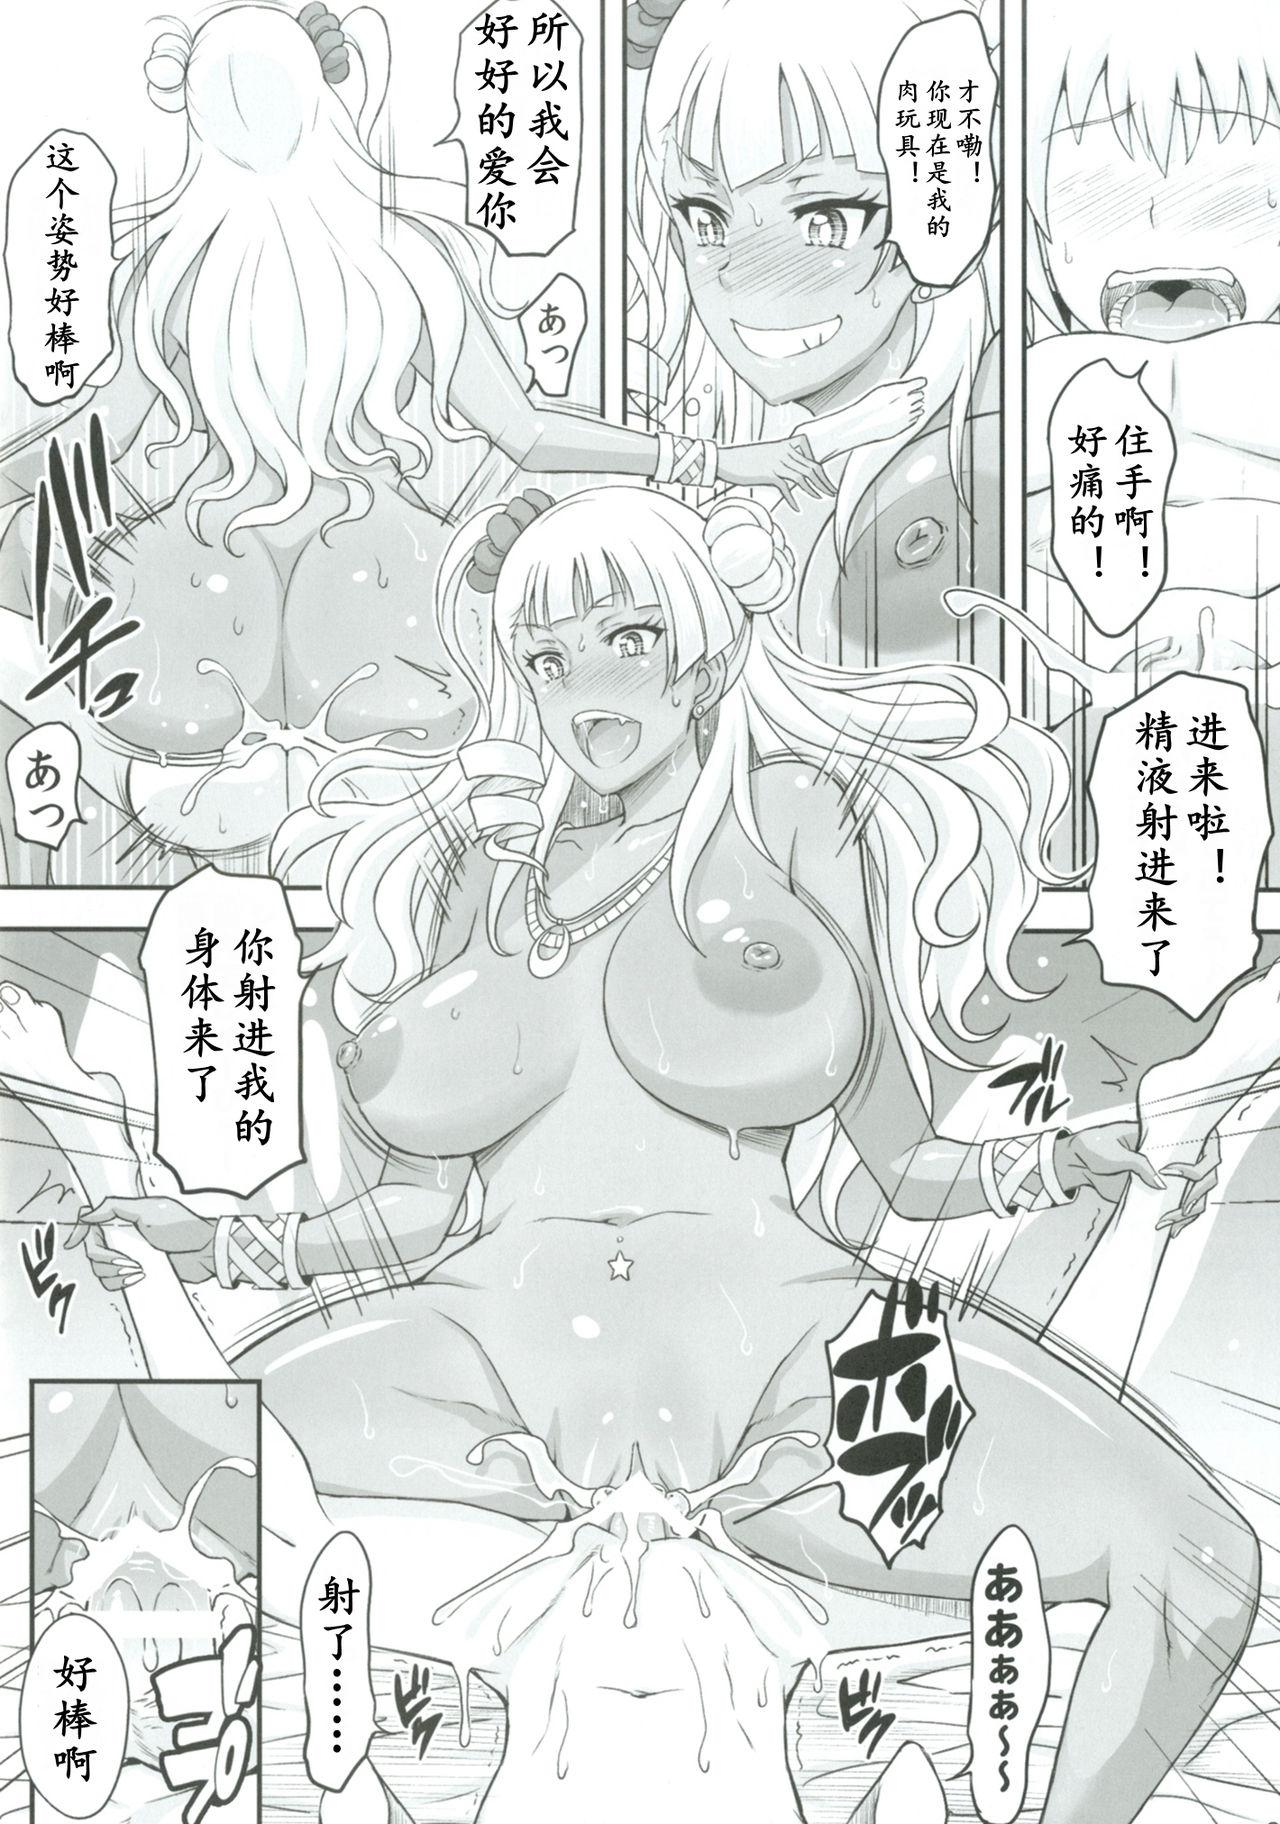 Omakase Fudeoroshi Galko-chan 2 | 拜托你了!辣妹子2 18